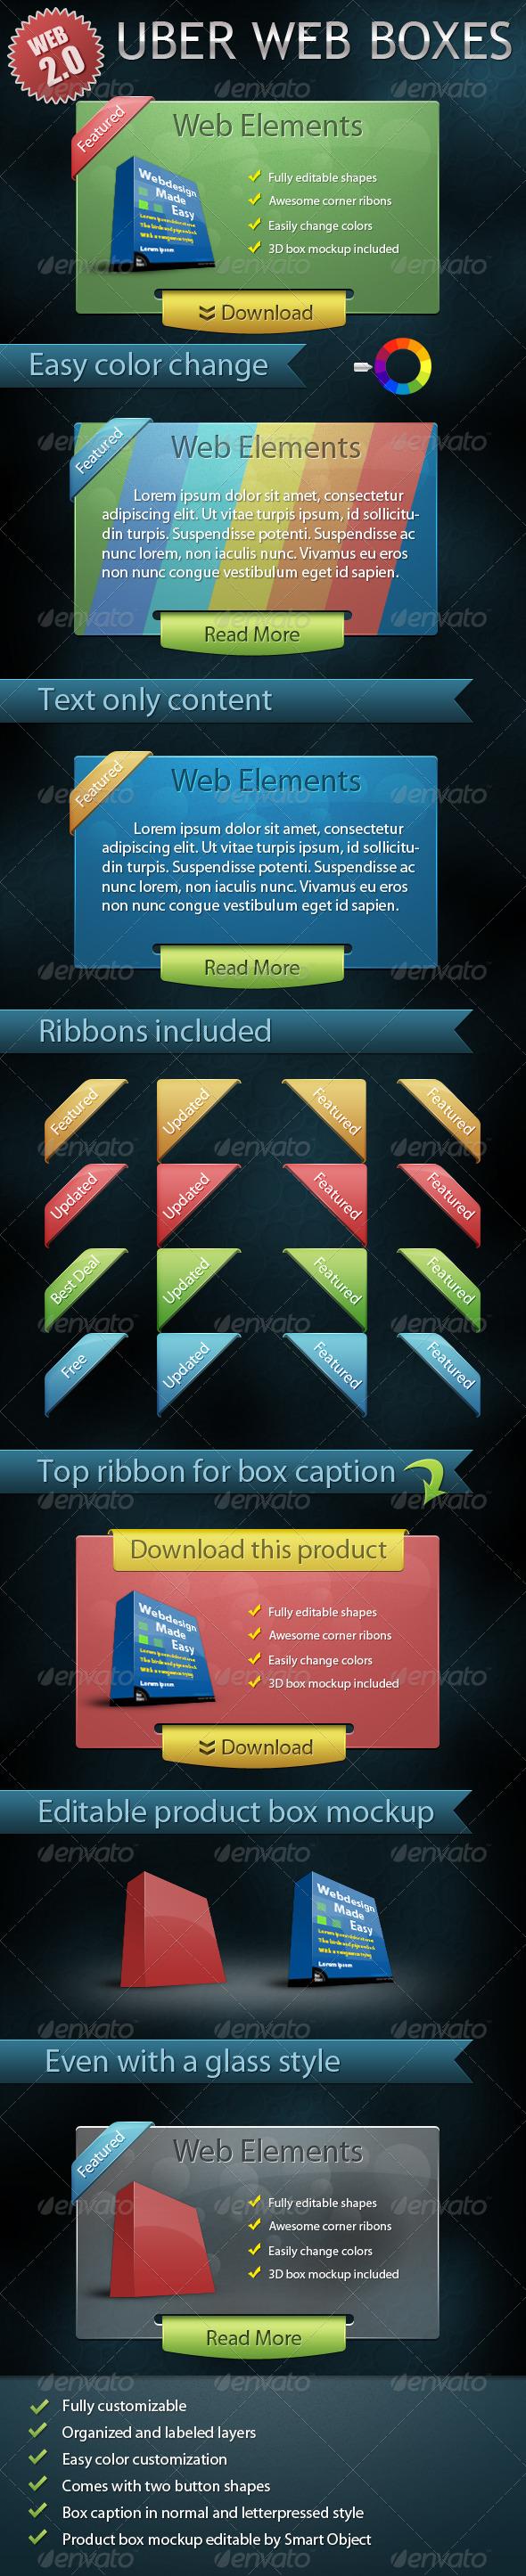 Uber Web Boxes - Miscellaneous Web Elements